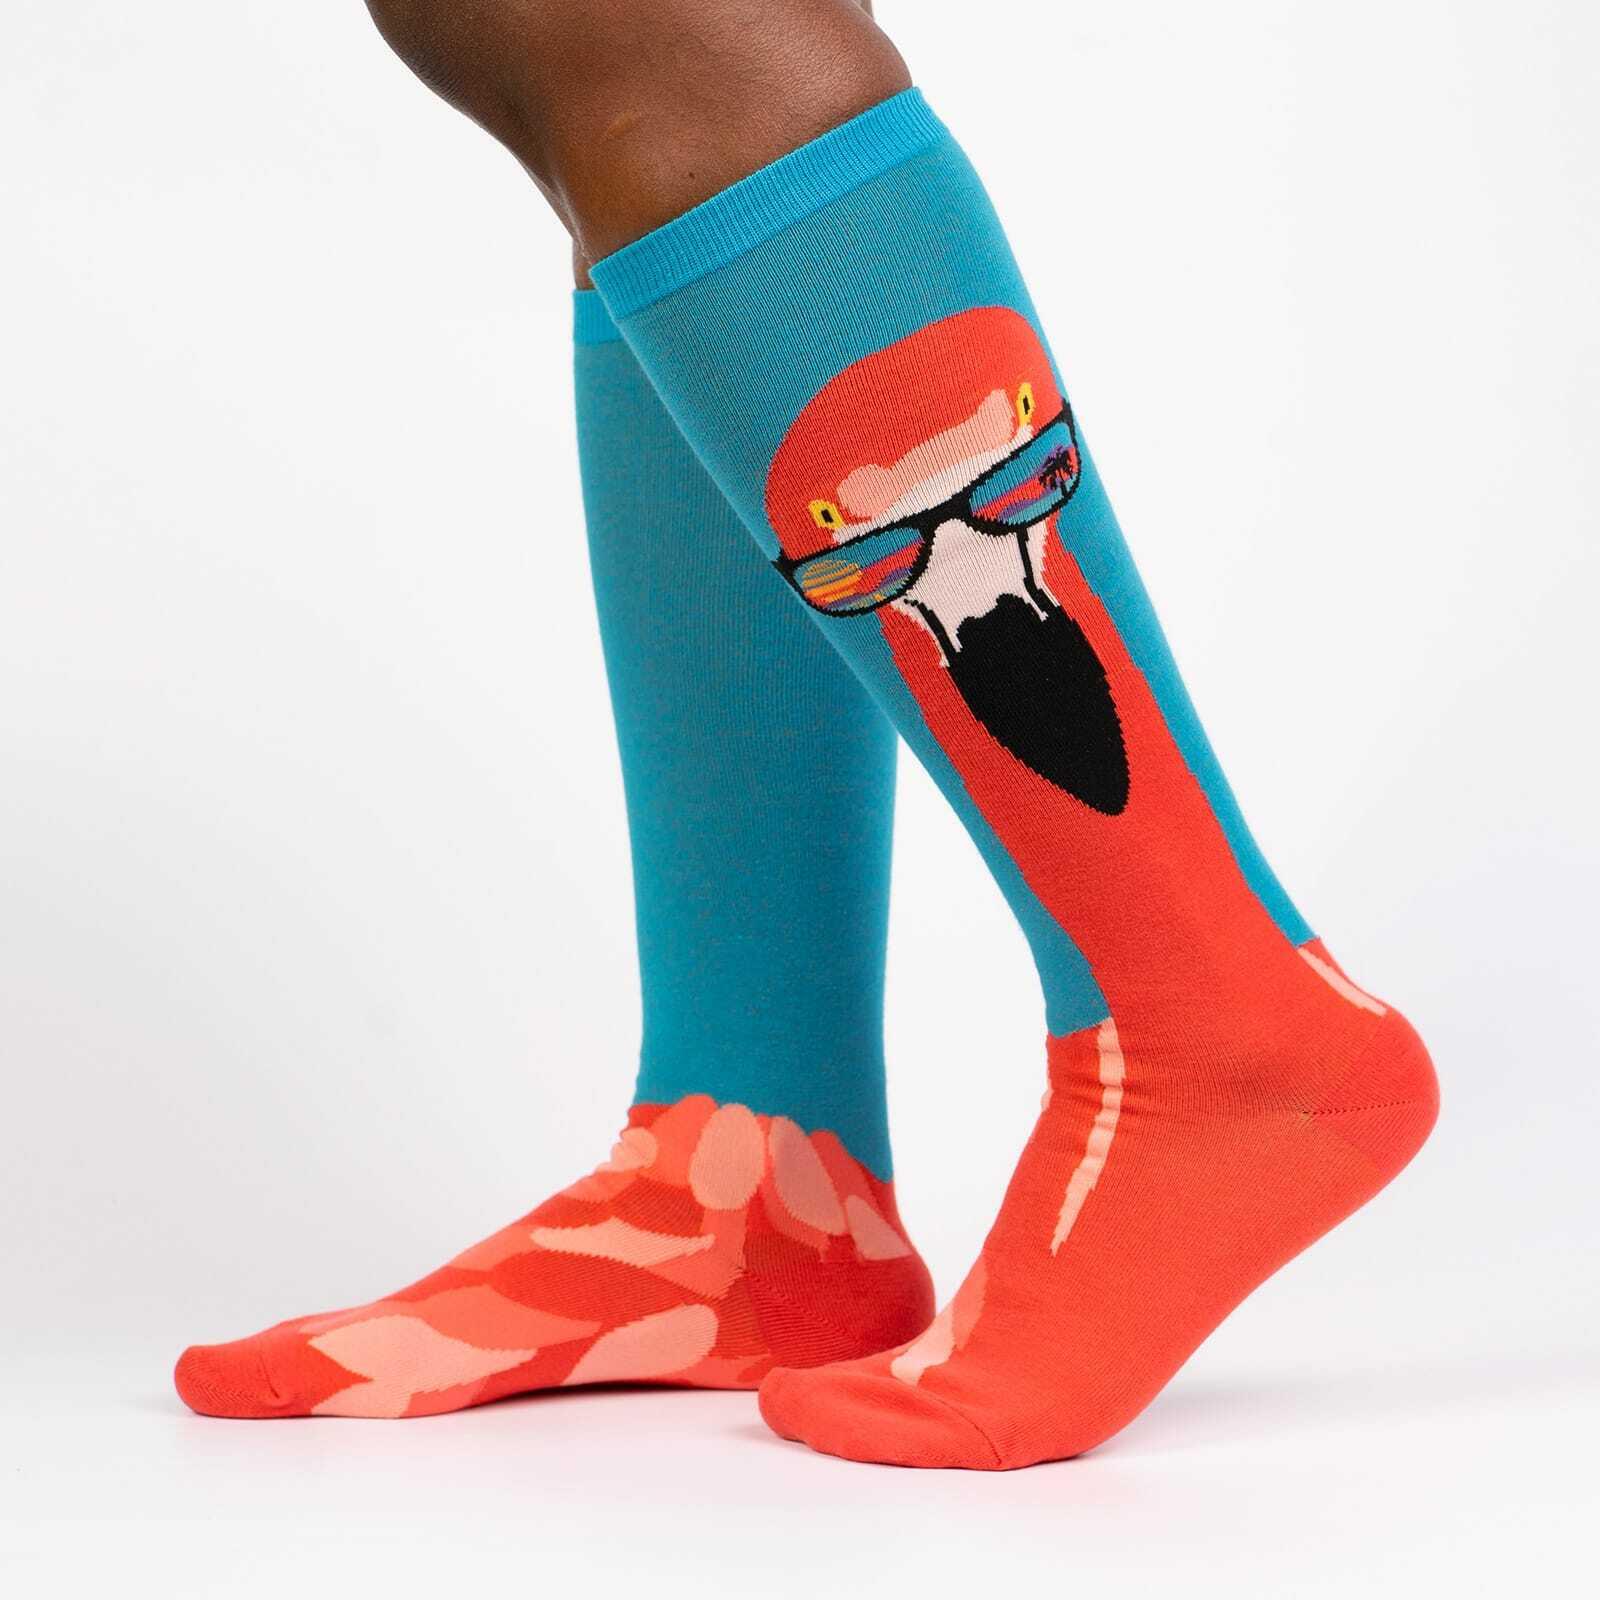 Ready to Flamingle - Flamingo Fun Animal Knee High Socks Unisex - Men's and Women's in Blue